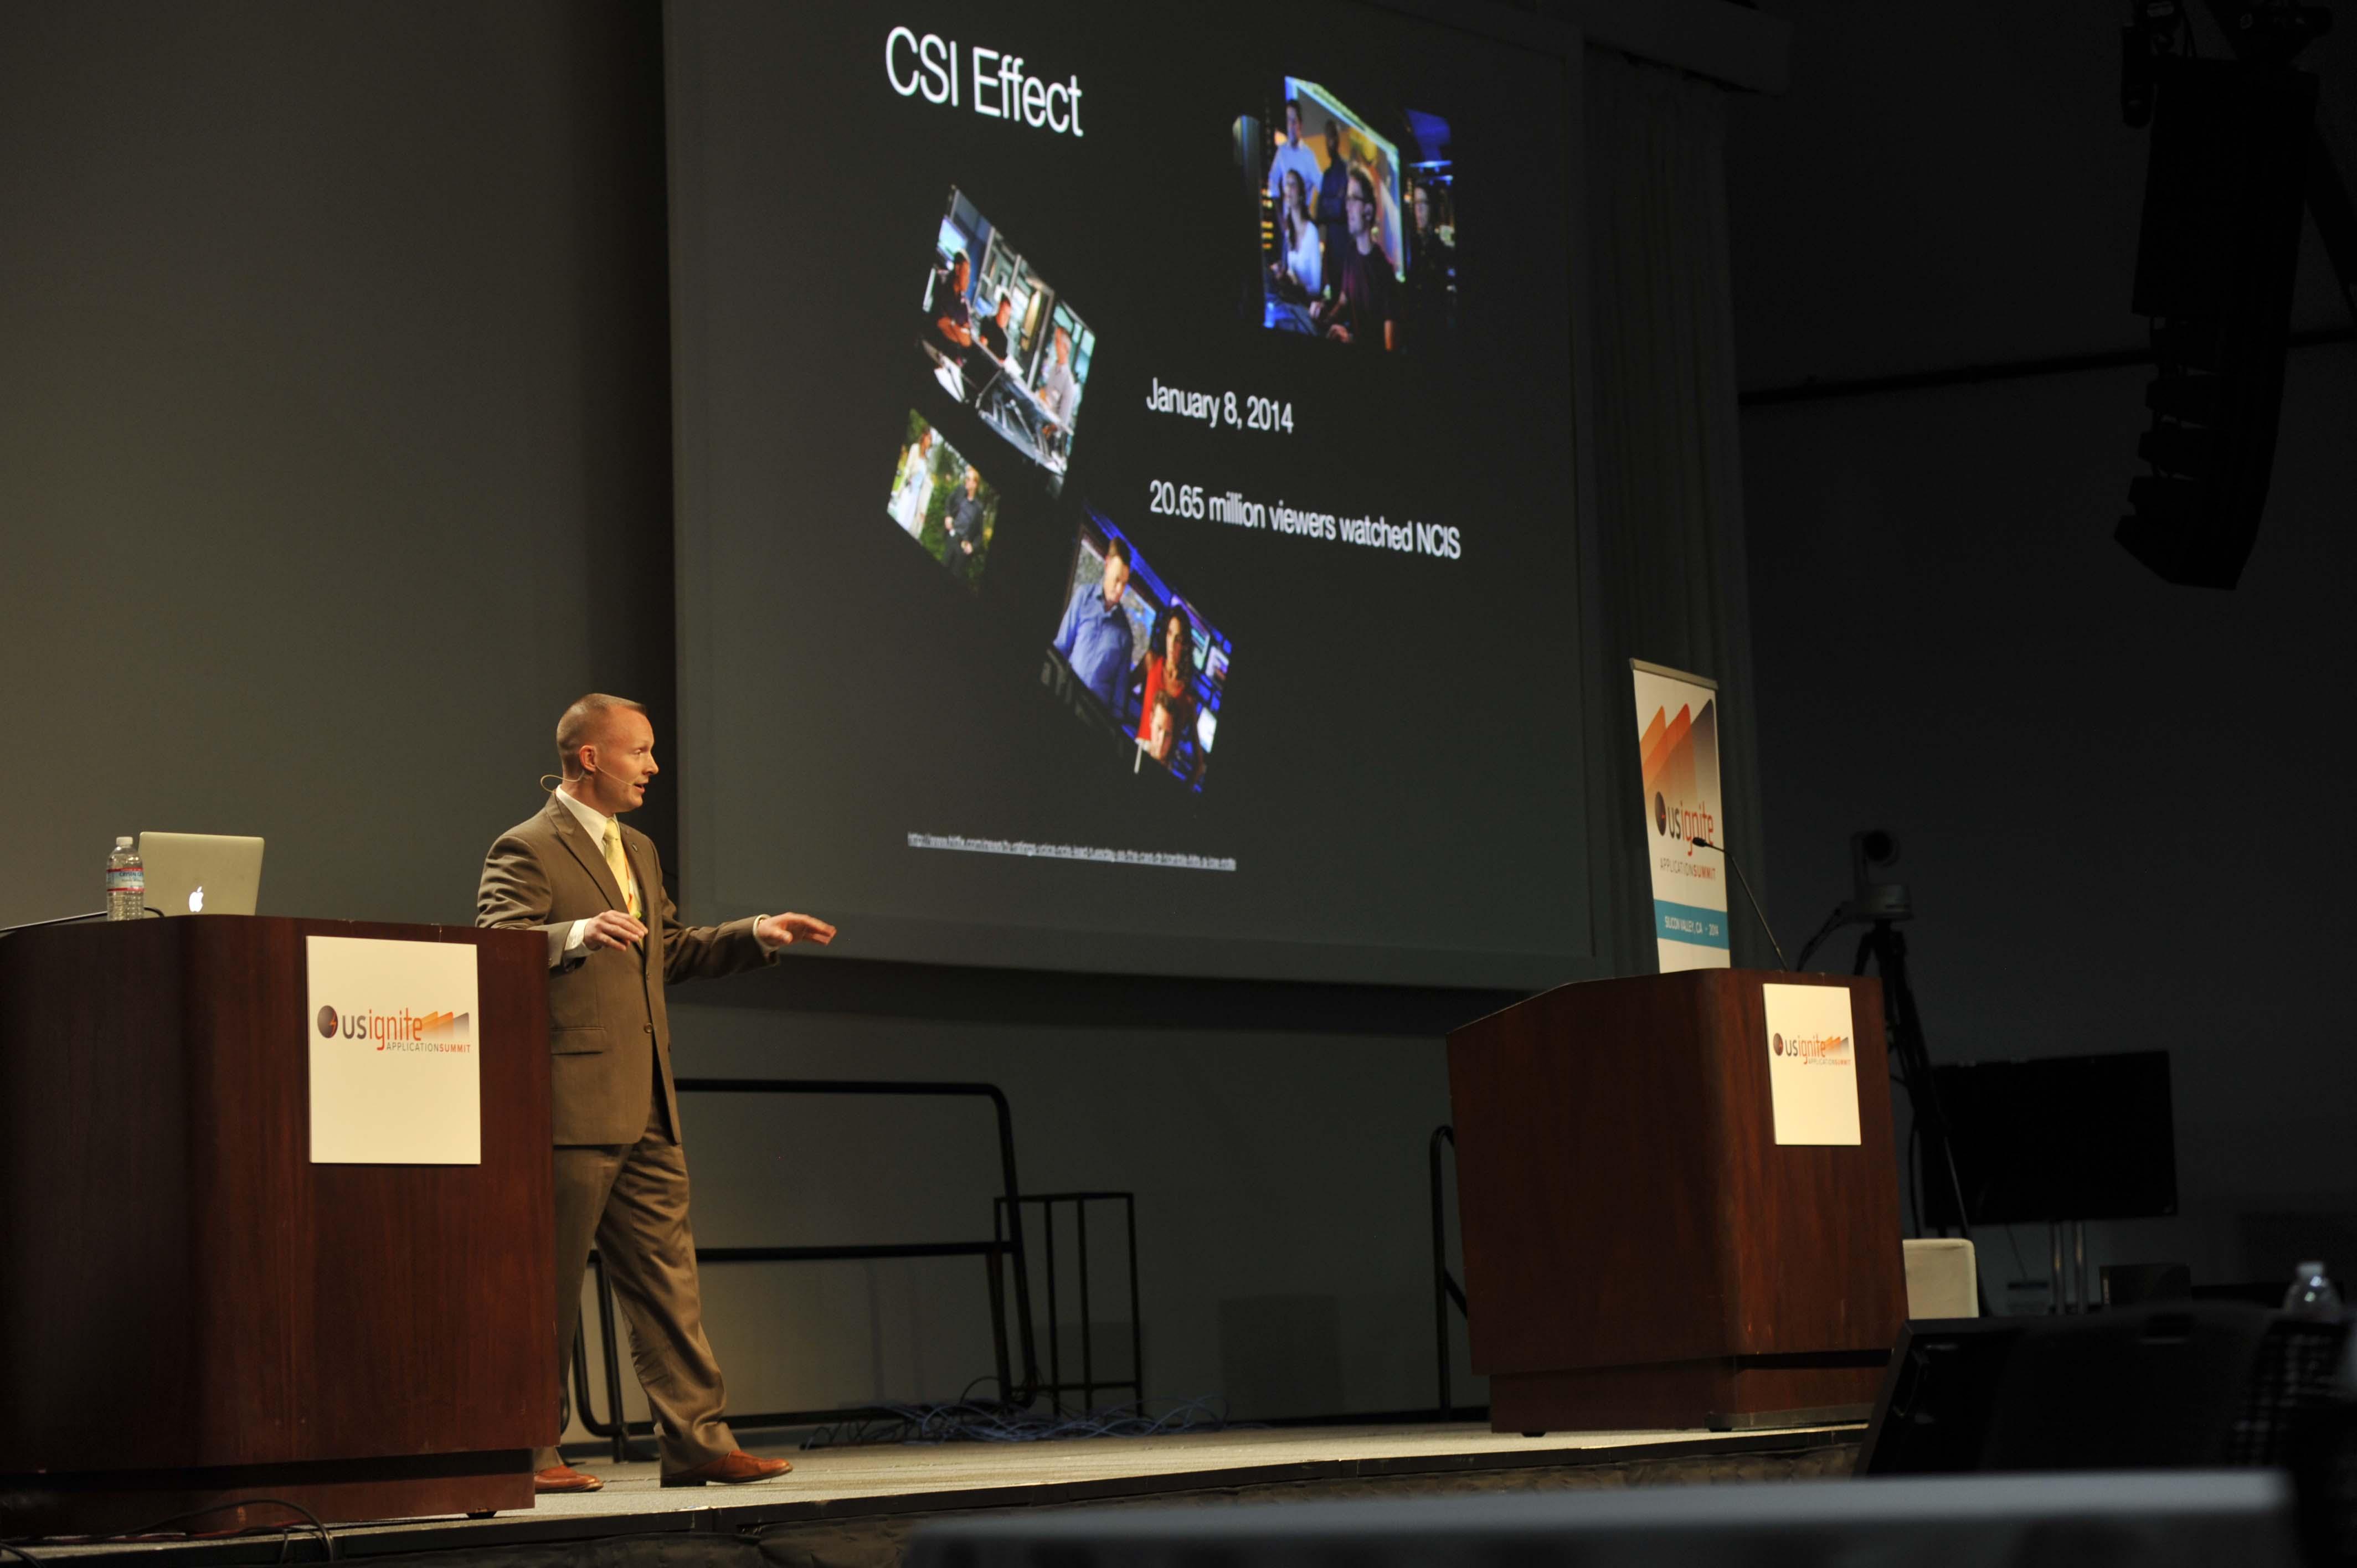 jonathan rajewski forensic cyber professor